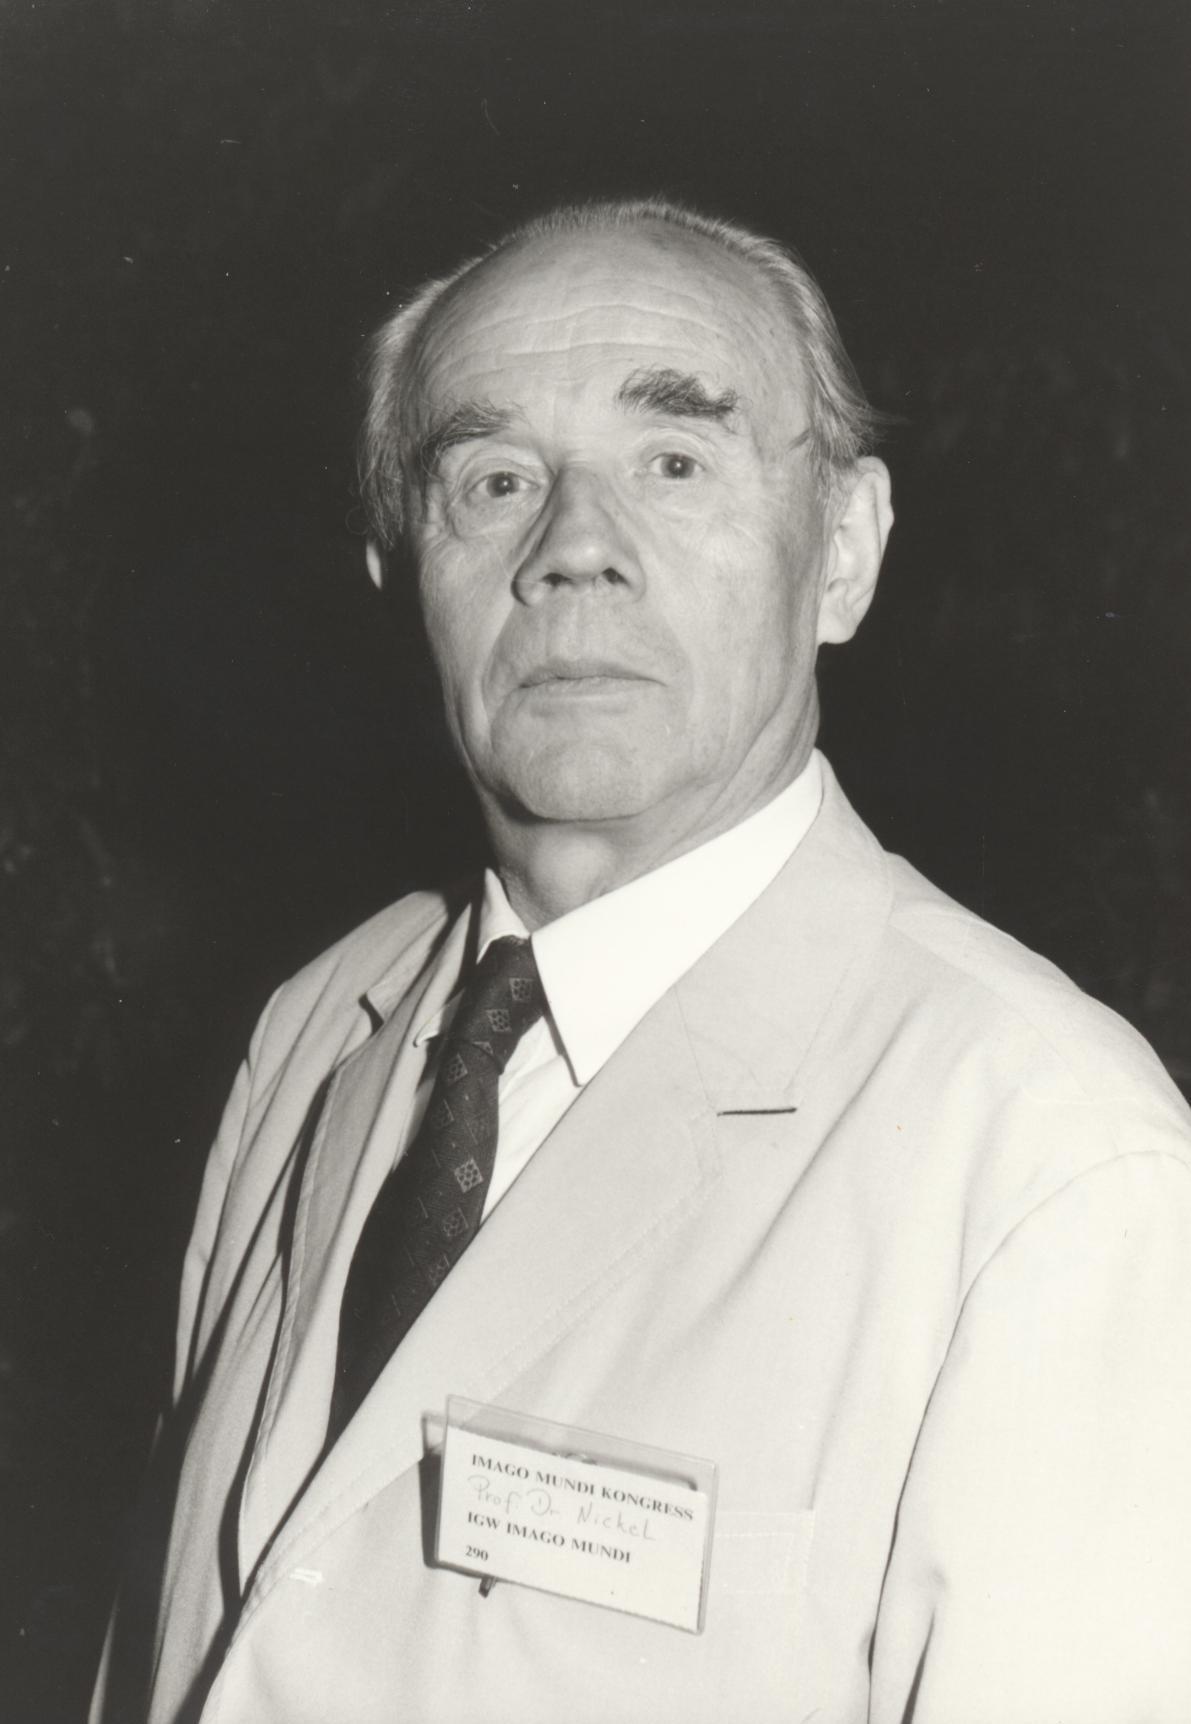 XIII. Imago Mundi-Kongress 1991, Innsbruck, Prof. Dr. Erwin Nickel